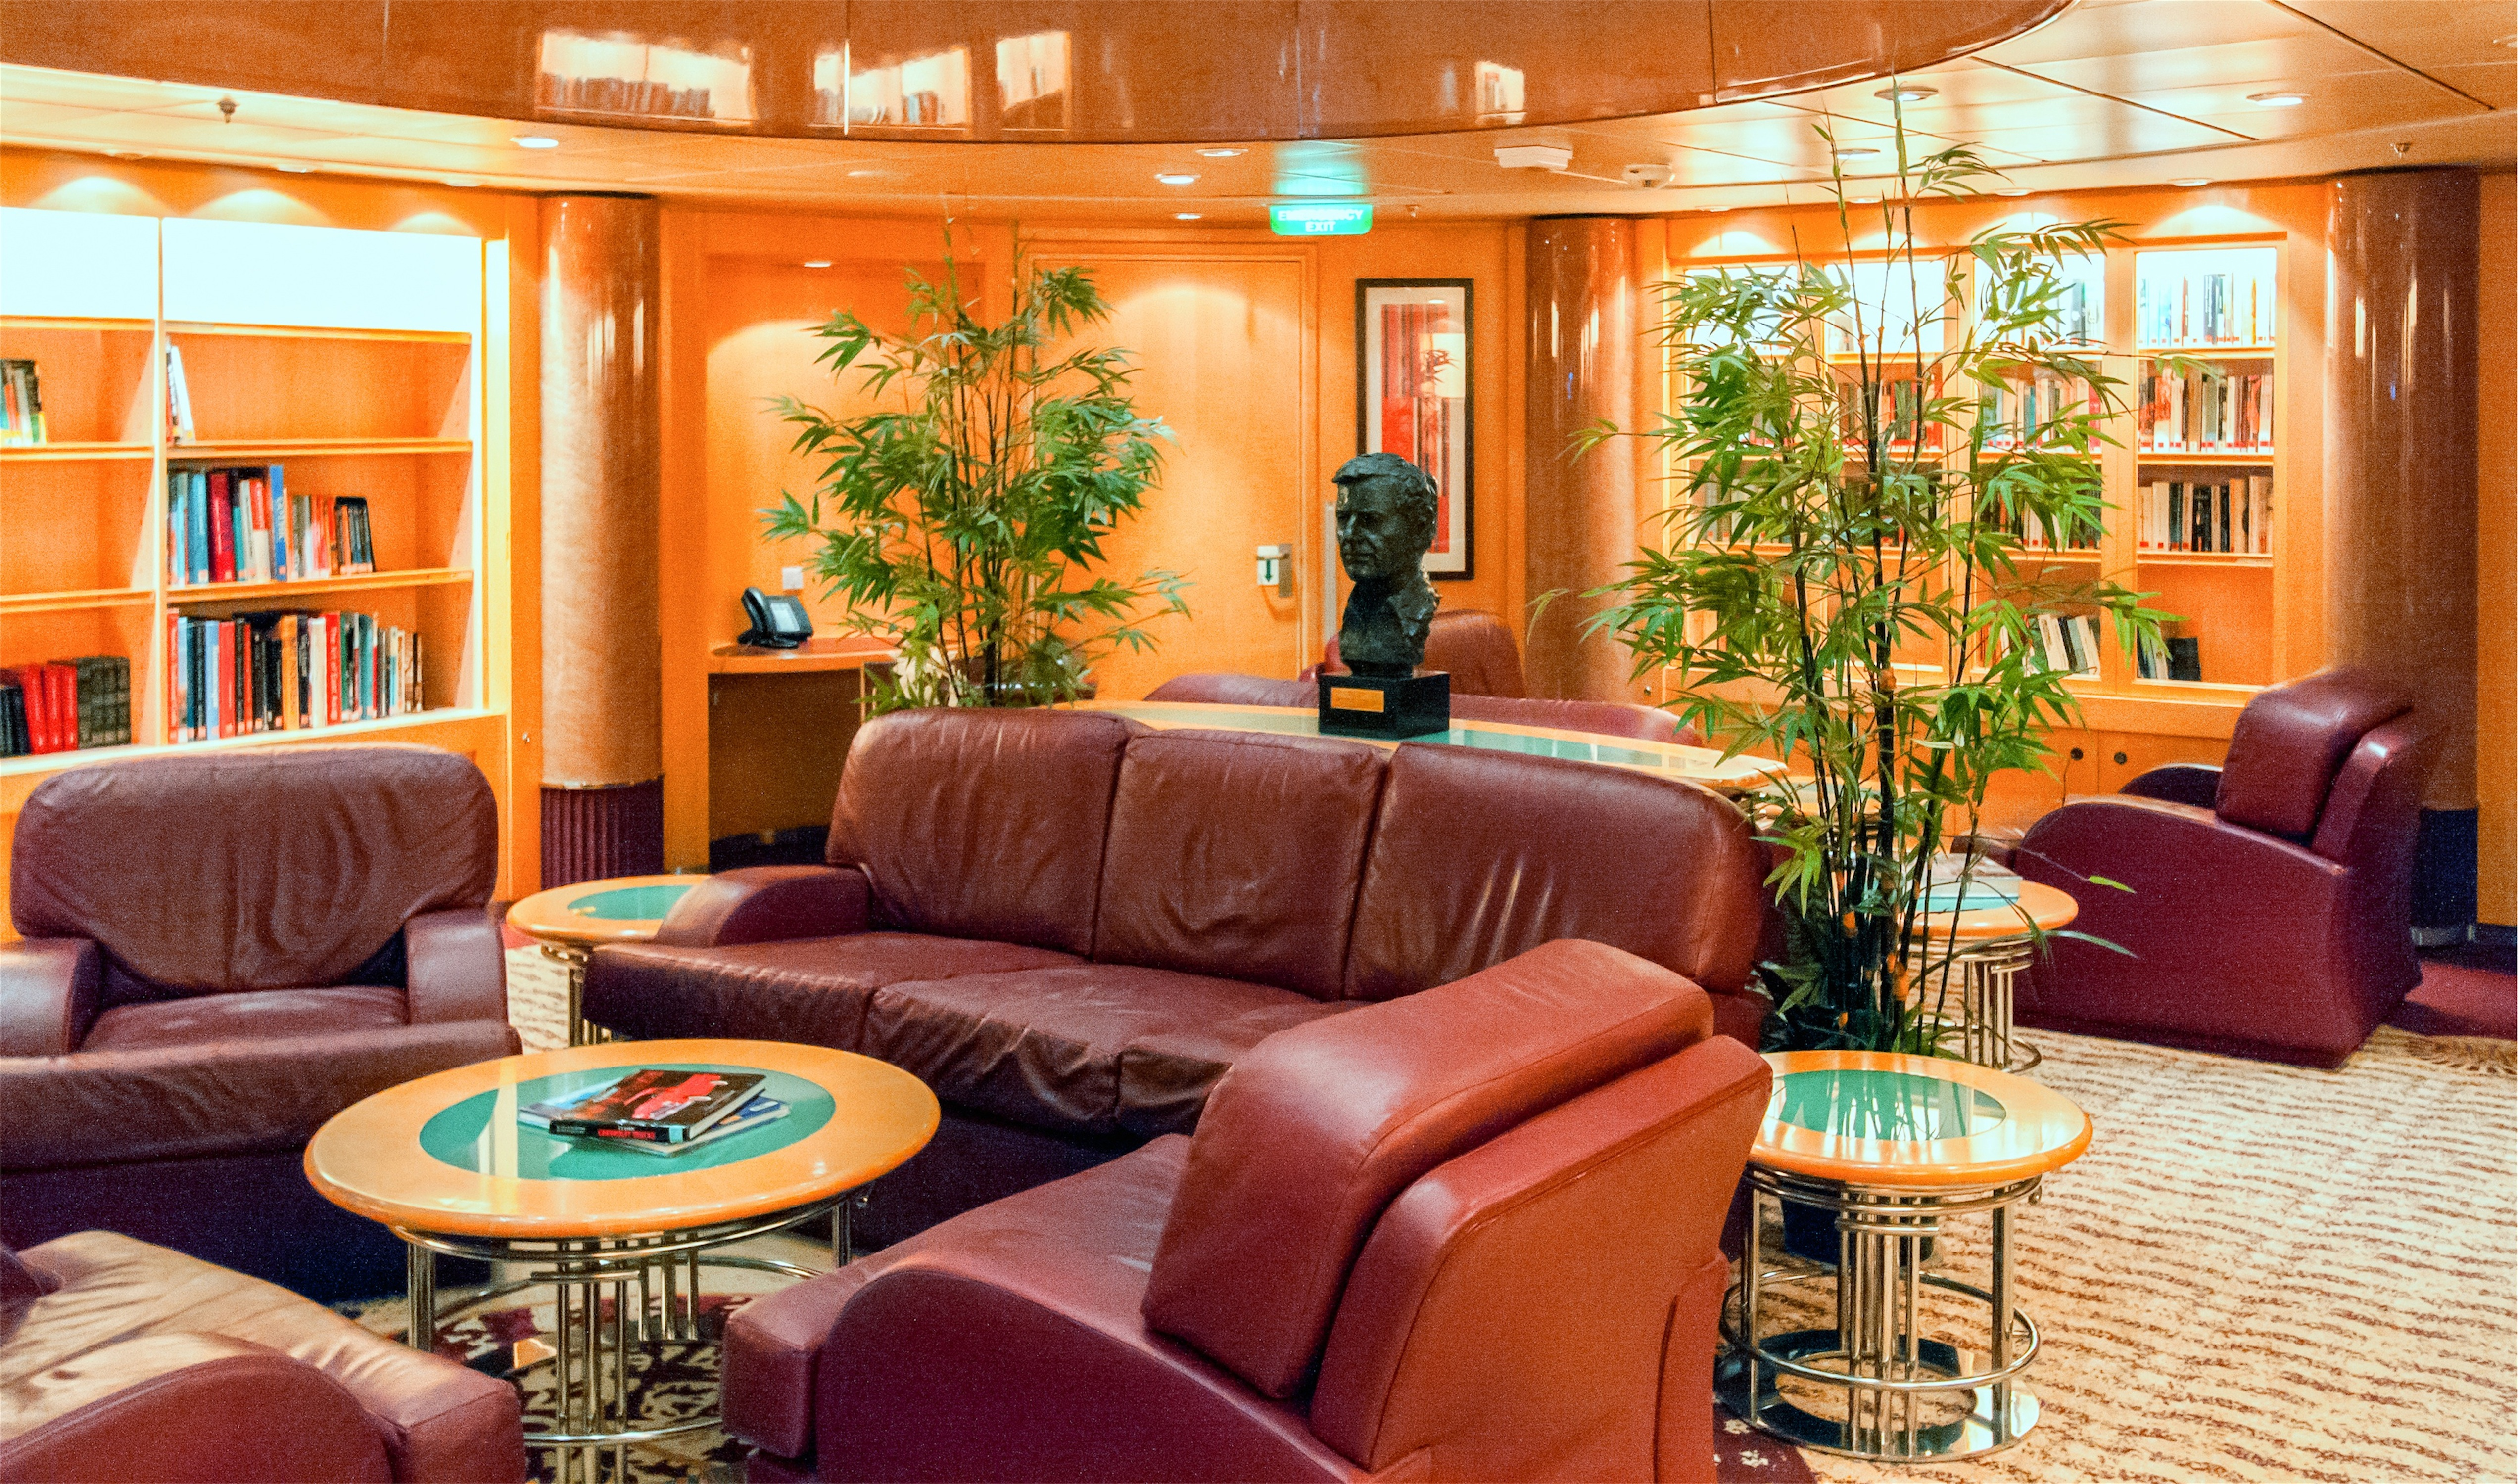 Royal Caribbean International Freedom of the Seas Interior 002.jpg